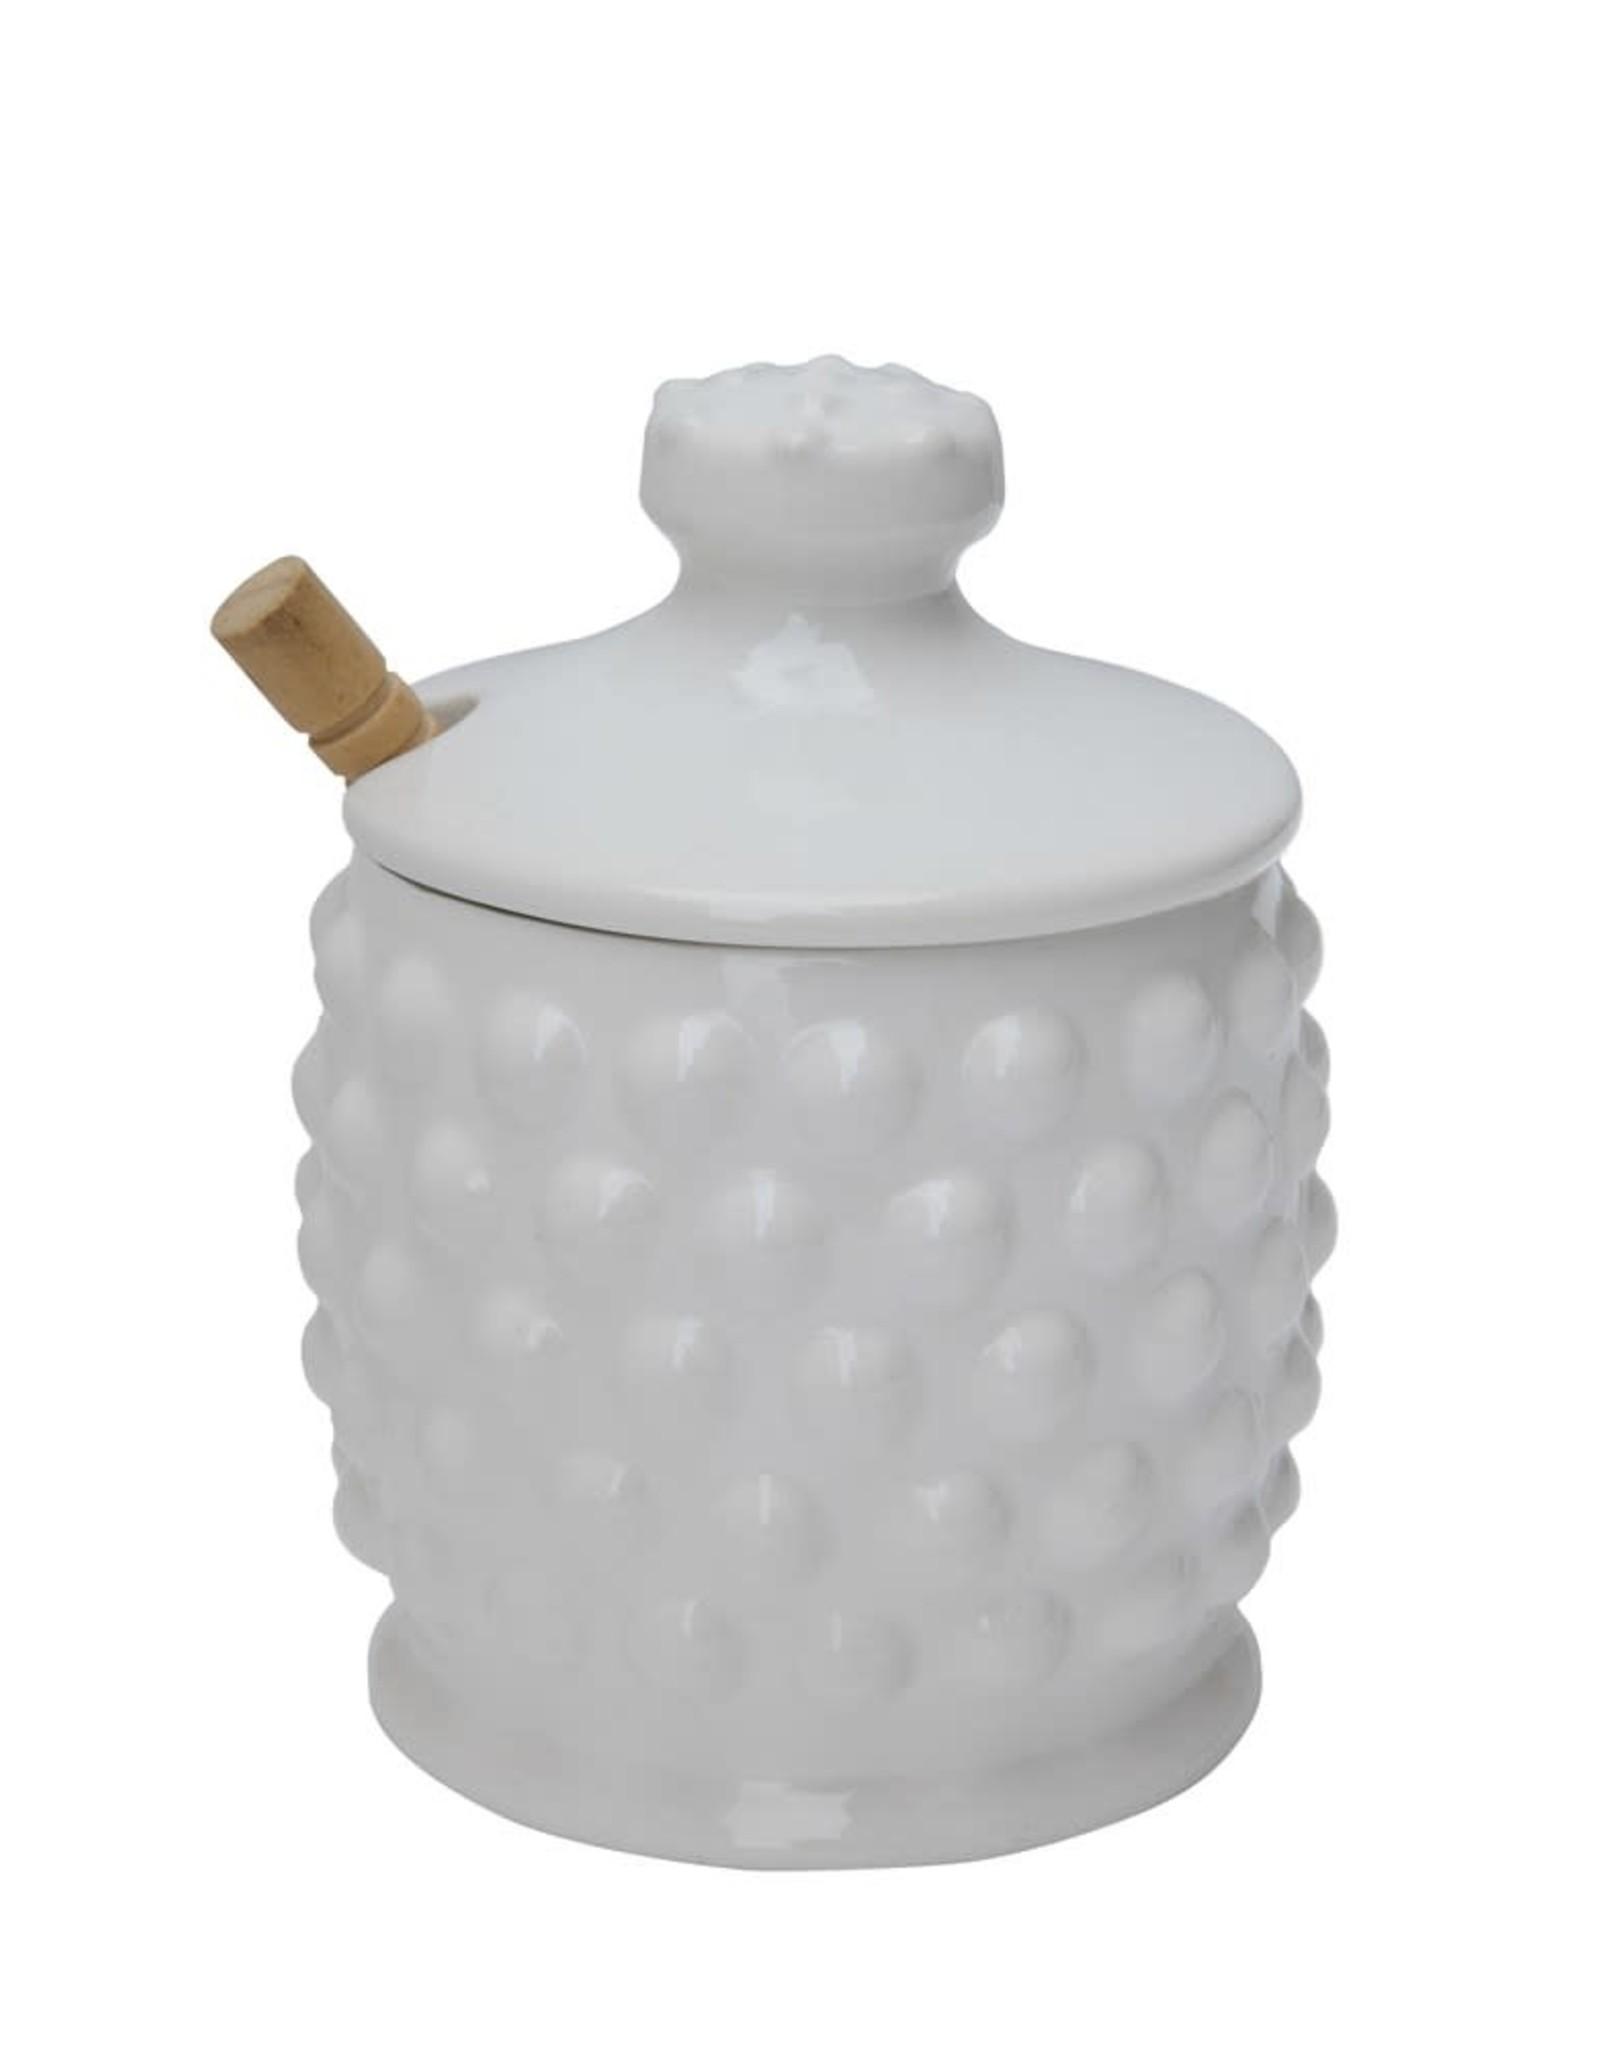 Wink Hobnail Honey Jar with Dipper